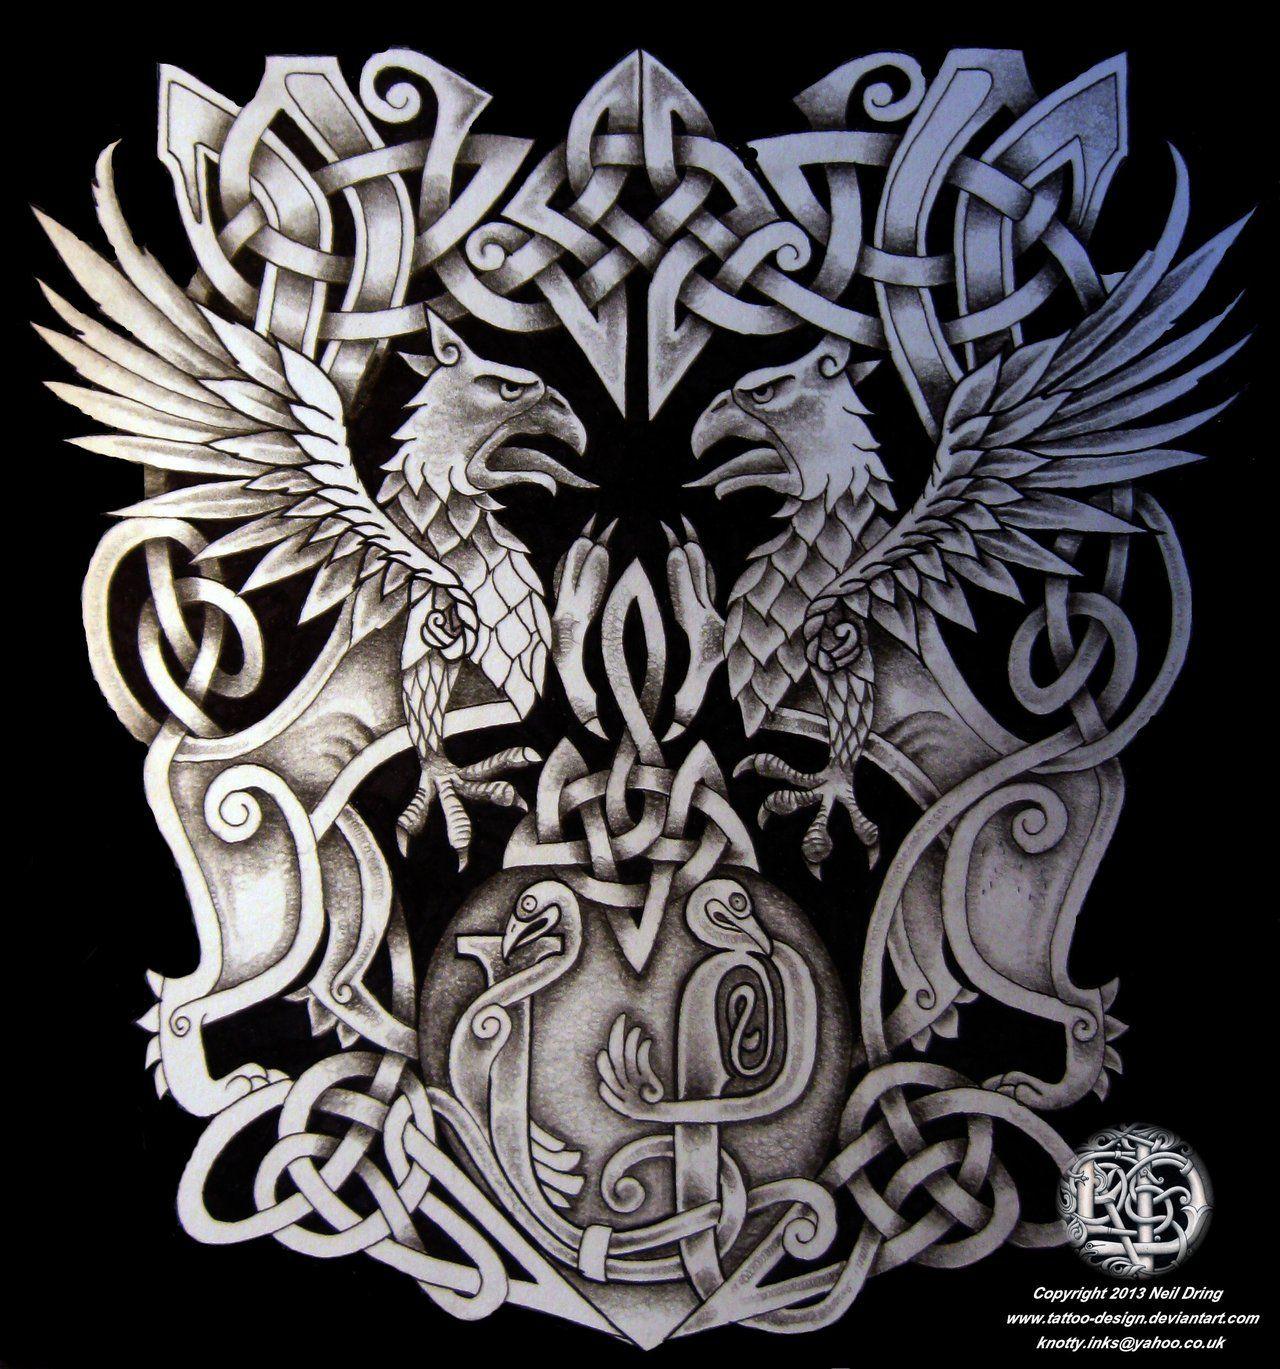 Family crest coat of arms by tattoo design pinterest family crest coat of arms by tattoo design celtic warrior tattoosceltic tattoosviking tattooswarrior symbol tattooirish biocorpaavc Gallery